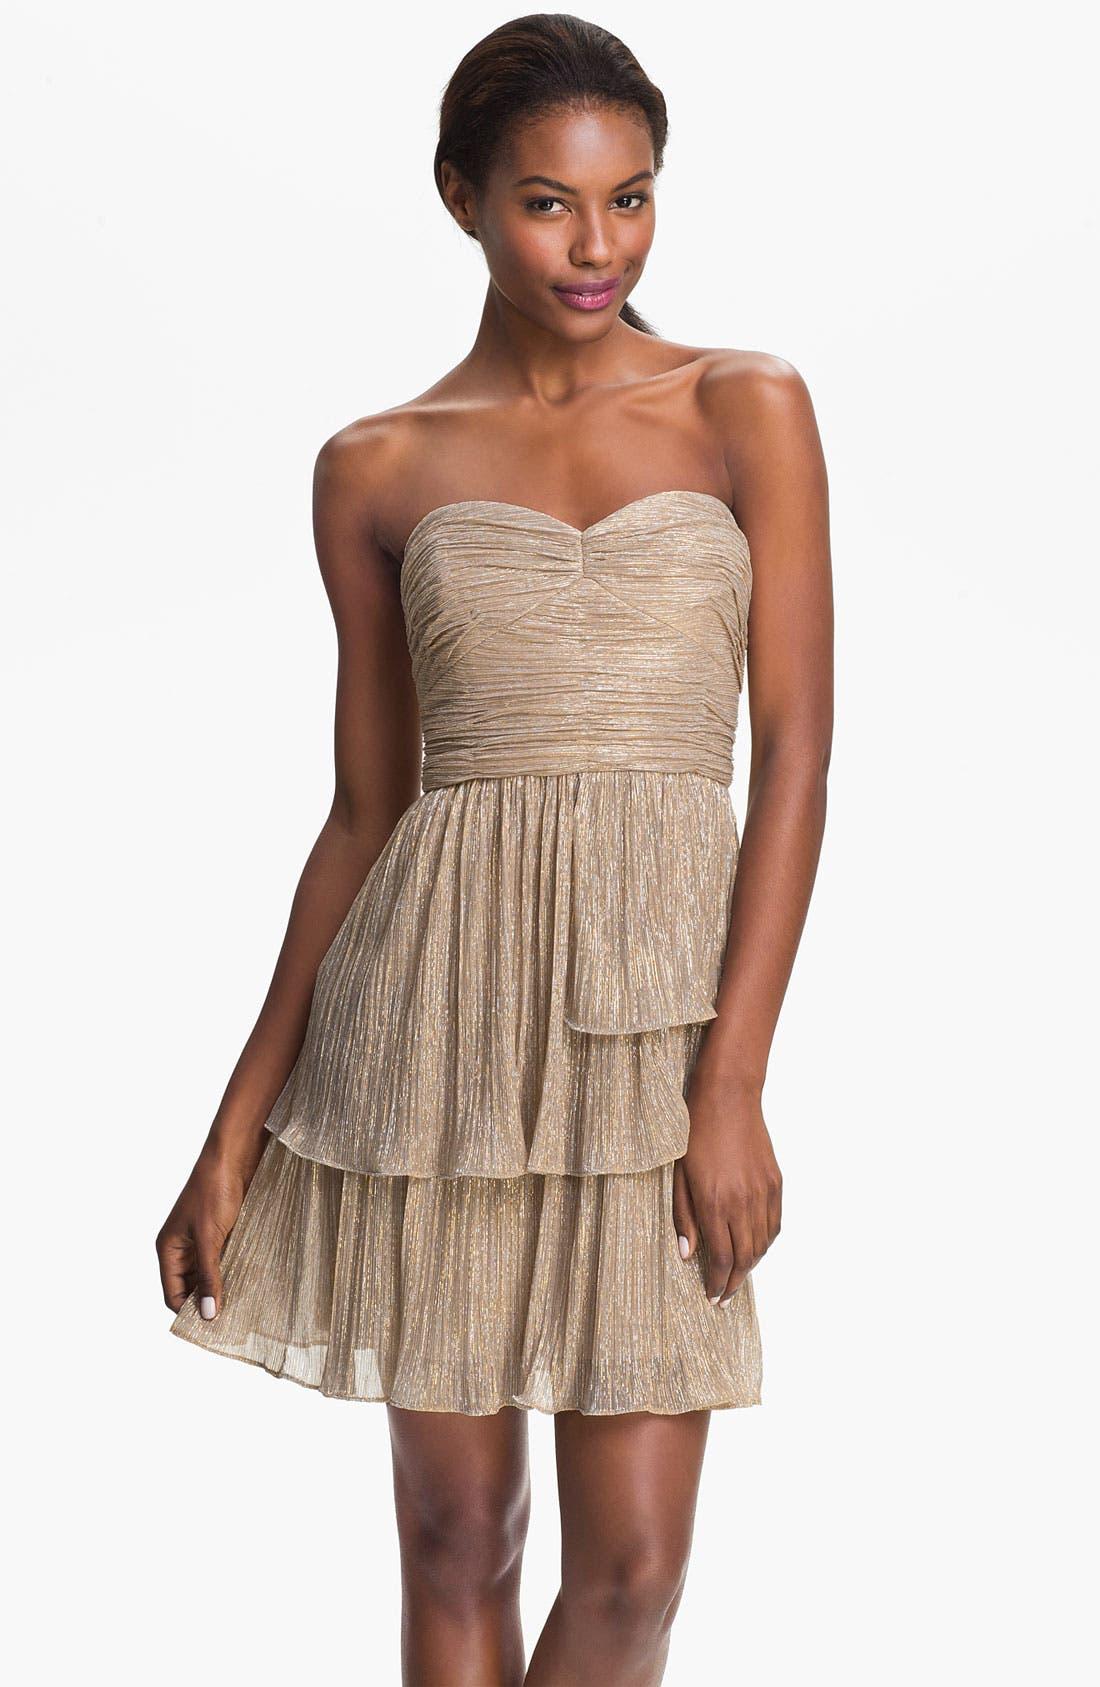 Alternate Image 1 Selected - Max & Cleo 'Rebecca' Ruched Metallic Dress